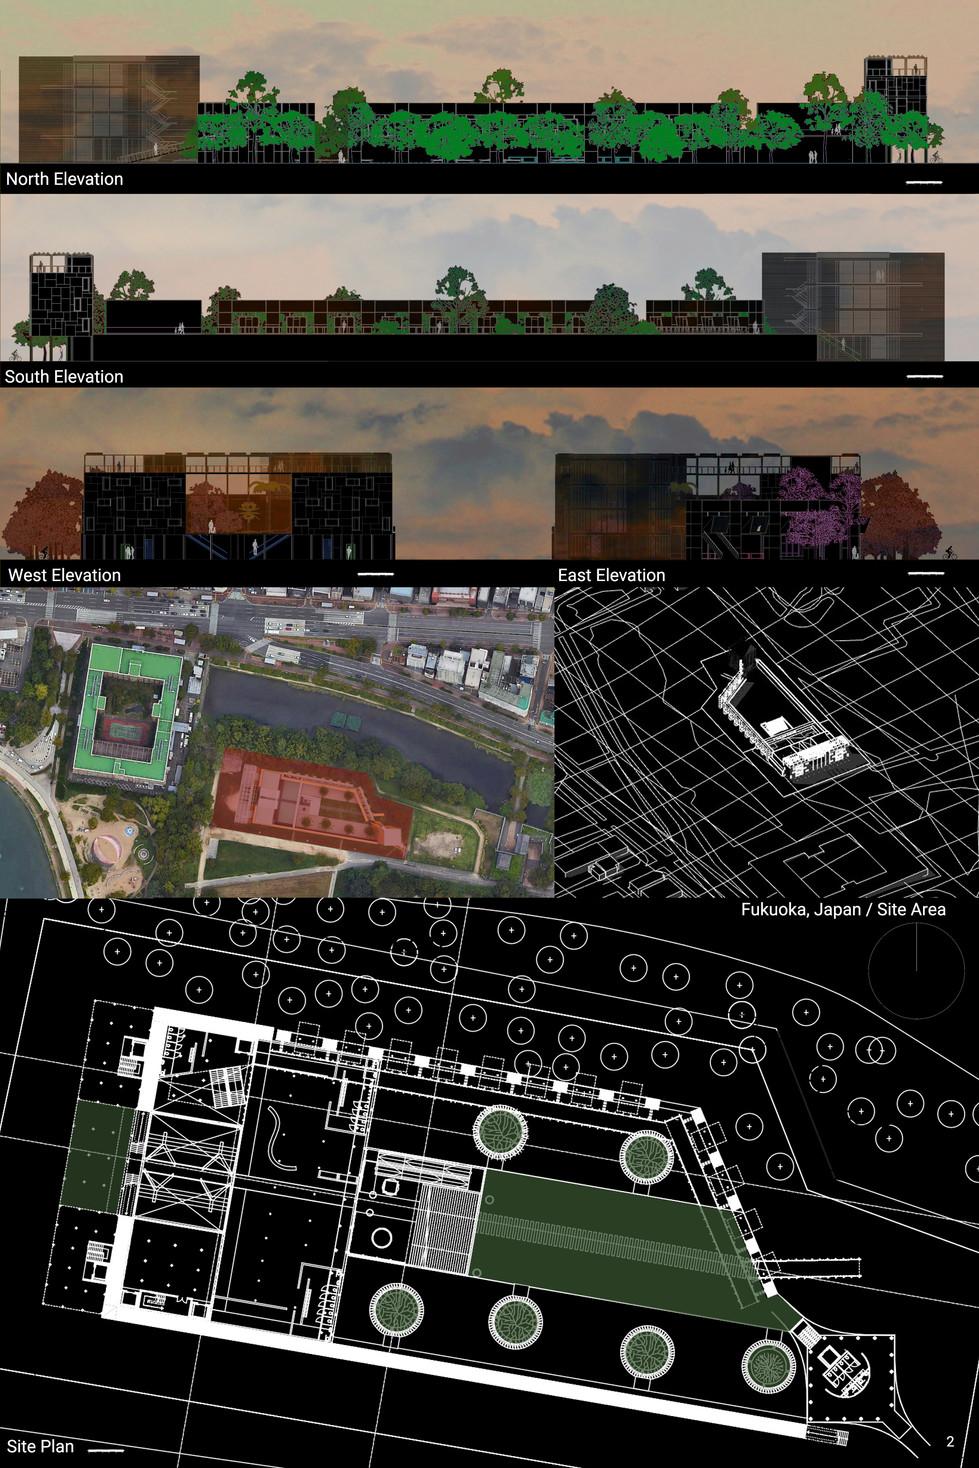 Site Plan / Elevations